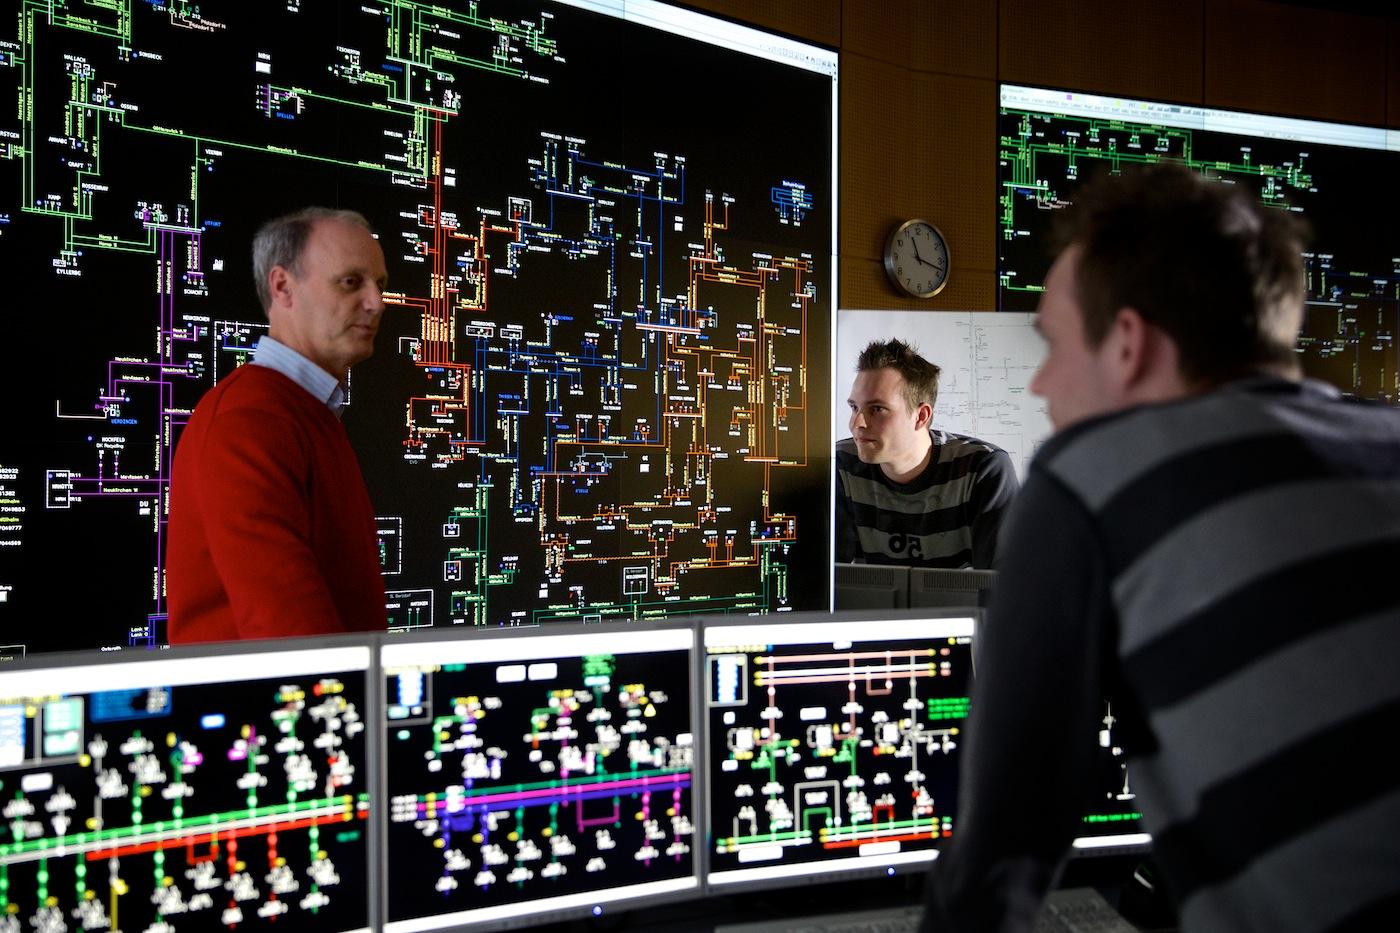 RWE | Schaltzentrale